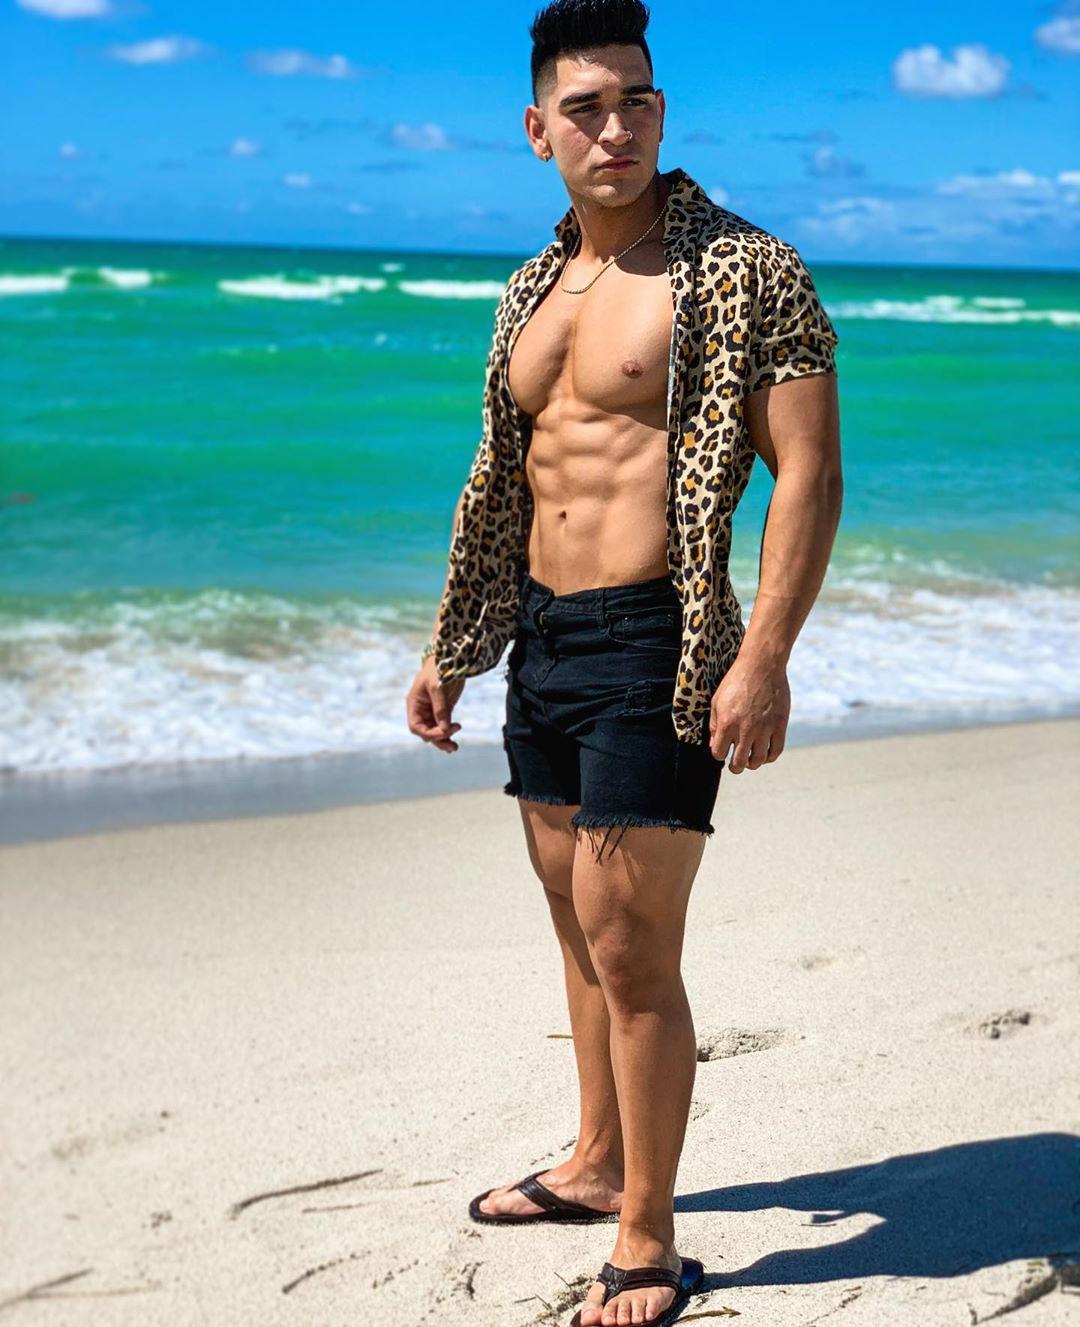 sexy-beefy-muscle-stud-huge-pecs-abs-beach